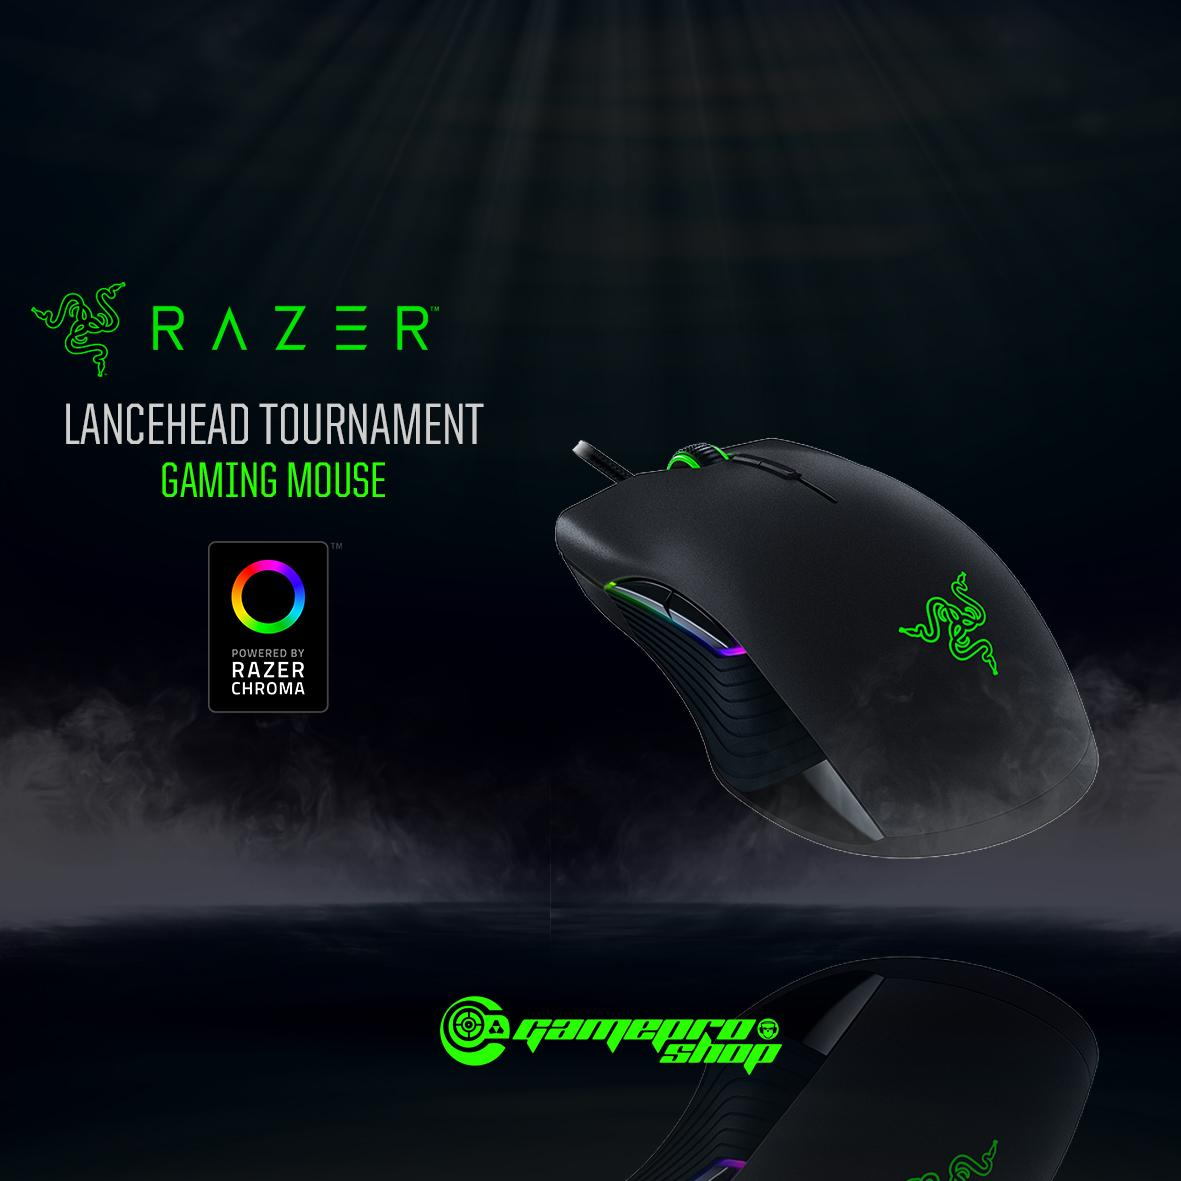 Sale Razer Lancehead Tournament Edition Gaming Mouse Gss Promo Razer Online